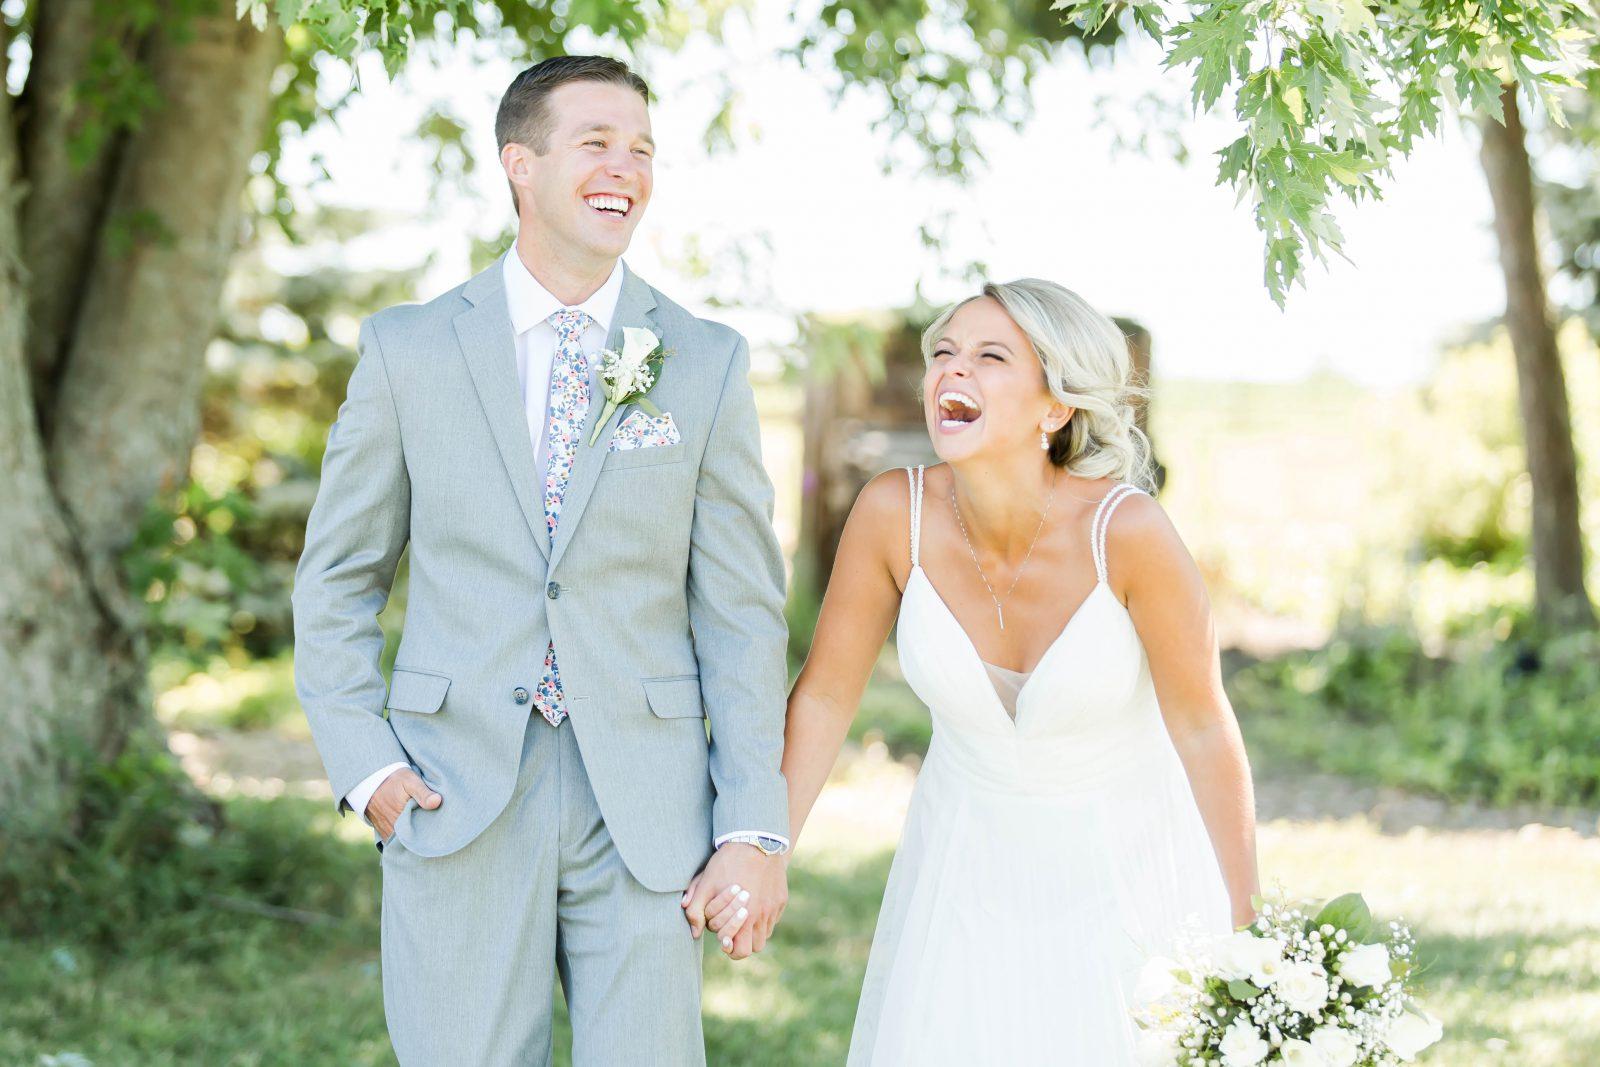 peacock-ridge-summer-wedding-photographer-akron-ohio-loren-jackson-photography-1-3